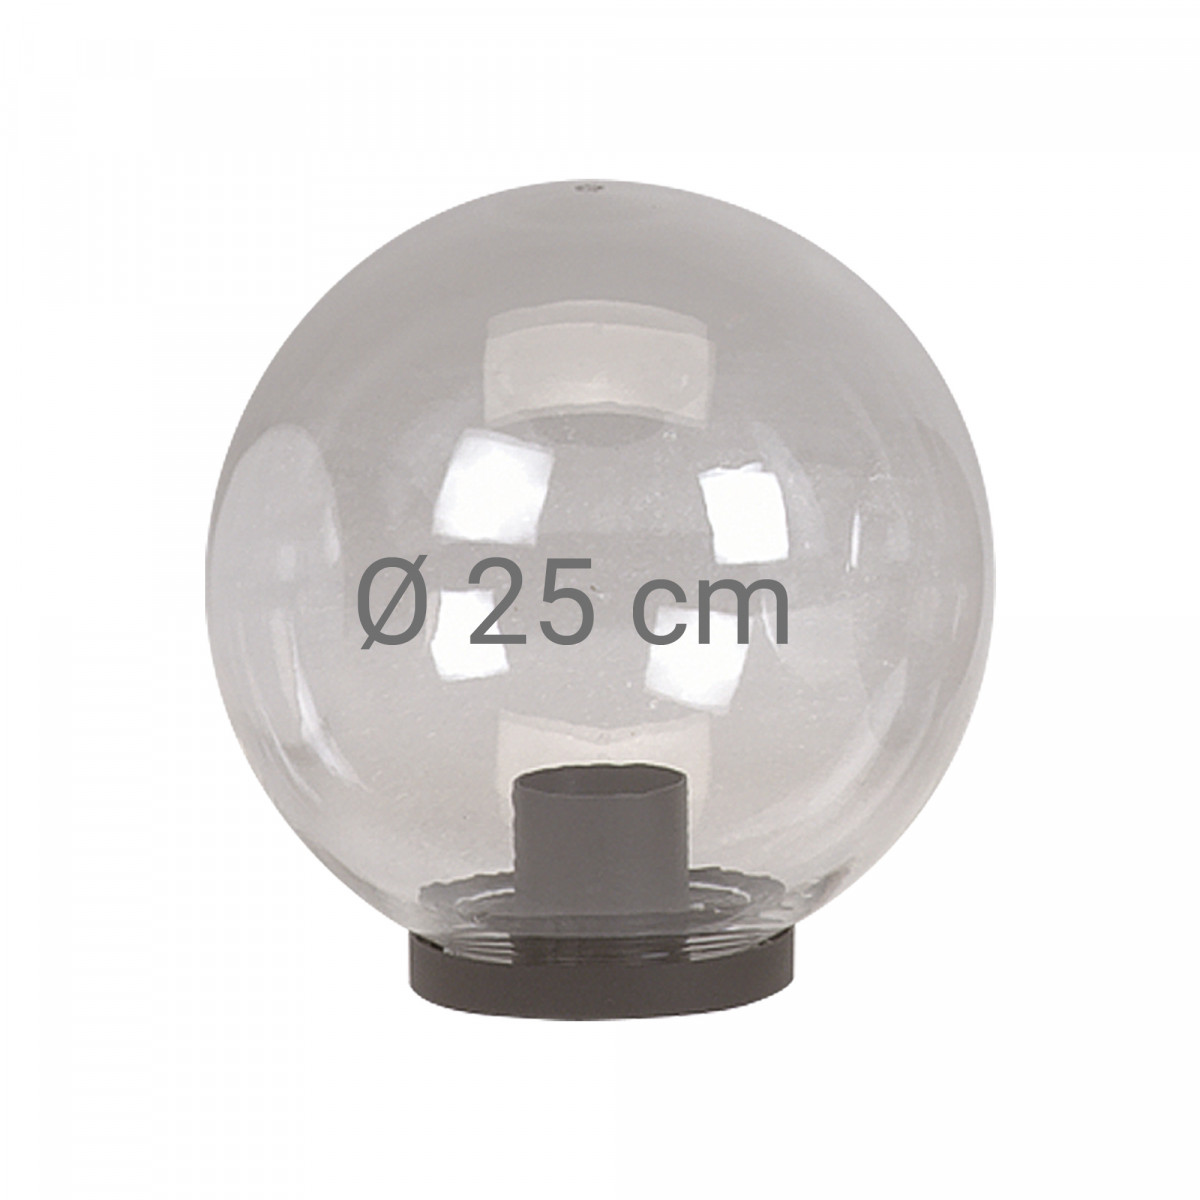 Globe 25 bol helder